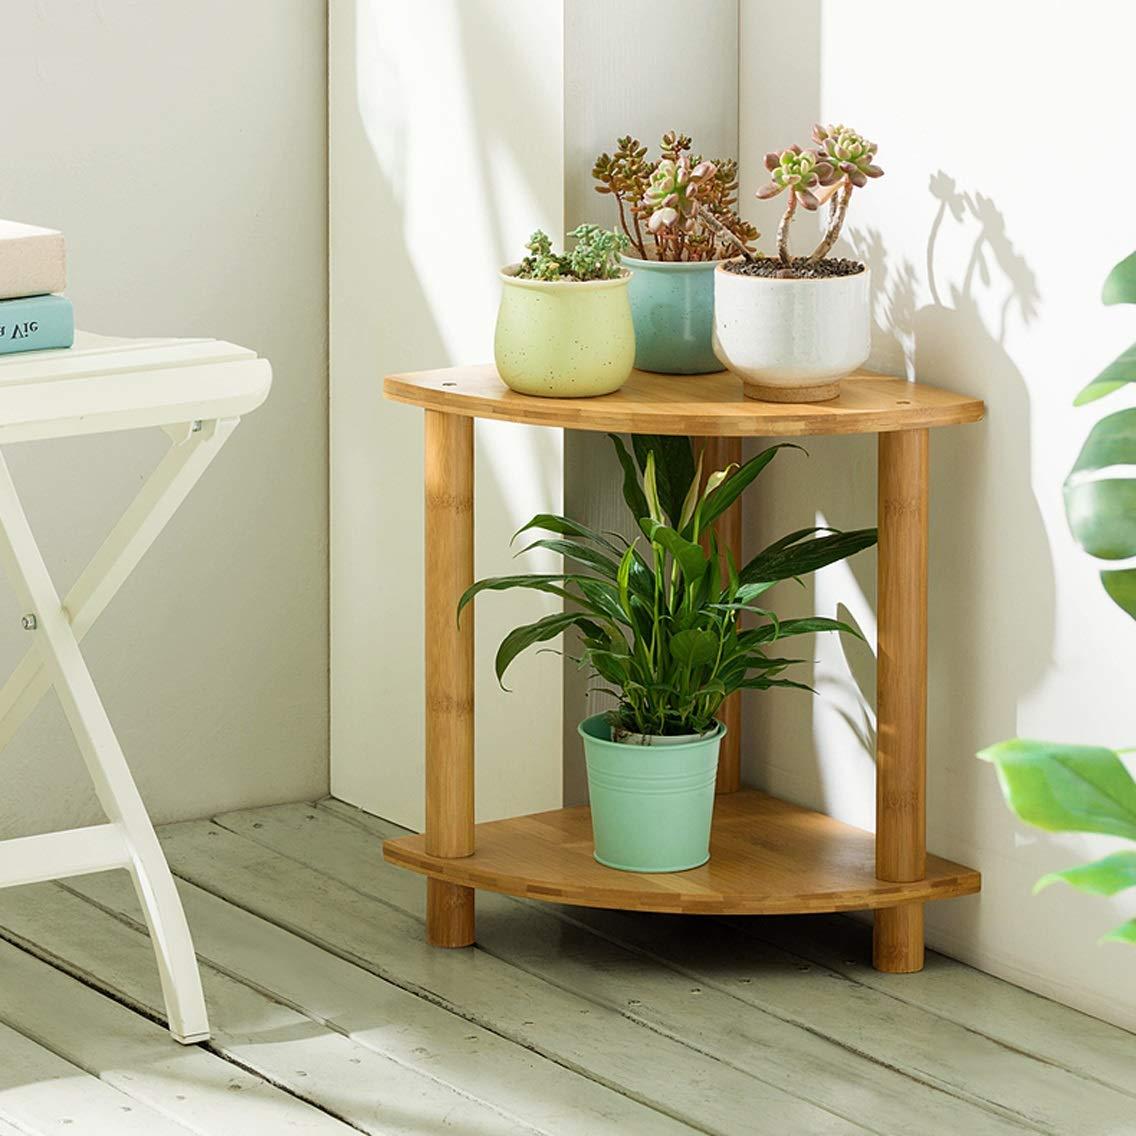 LRW Fan-Shaped Balcony Flower Rack Indoor Multi-Storey Living Room Flower Pot Rack, 40 Centimeters Tall